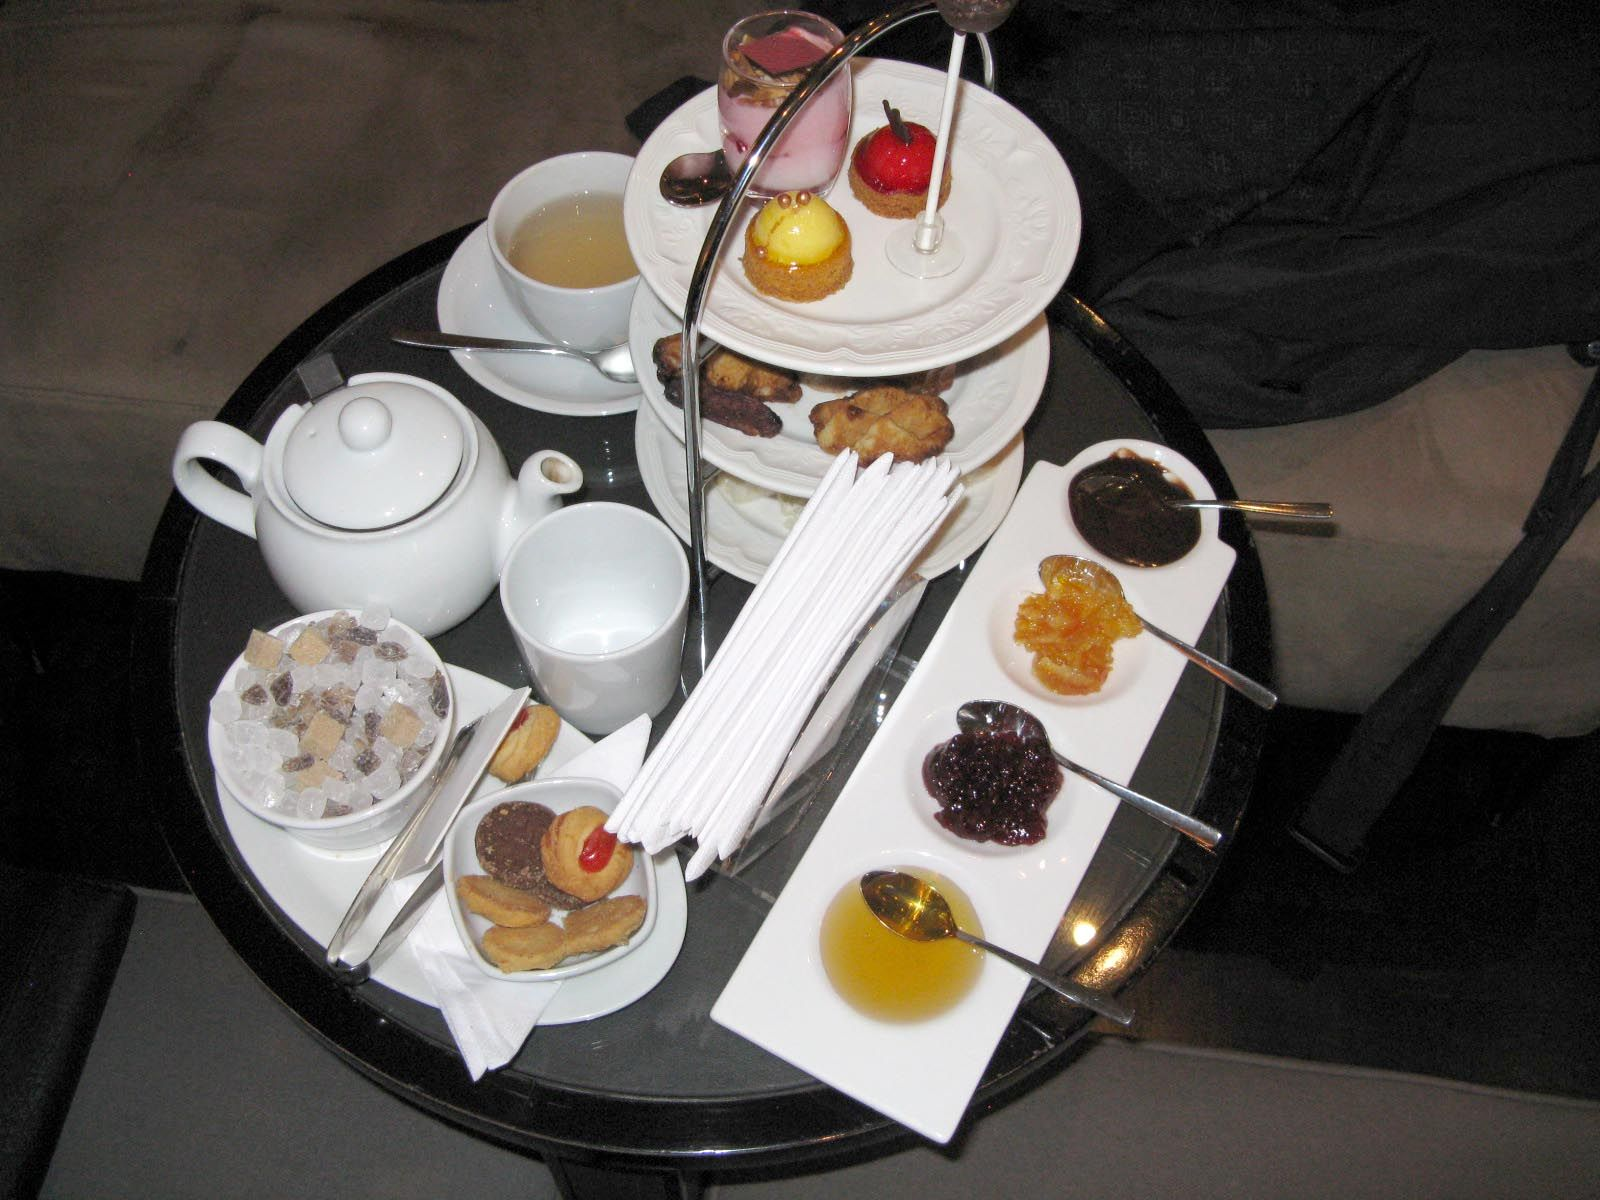 Image detail for -Afternoon Tea Hotel Amigo Brussels Belgium Table Setting & Image detail for -Afternoon Tea Hotel Amigo Brussels Belgium Table ...